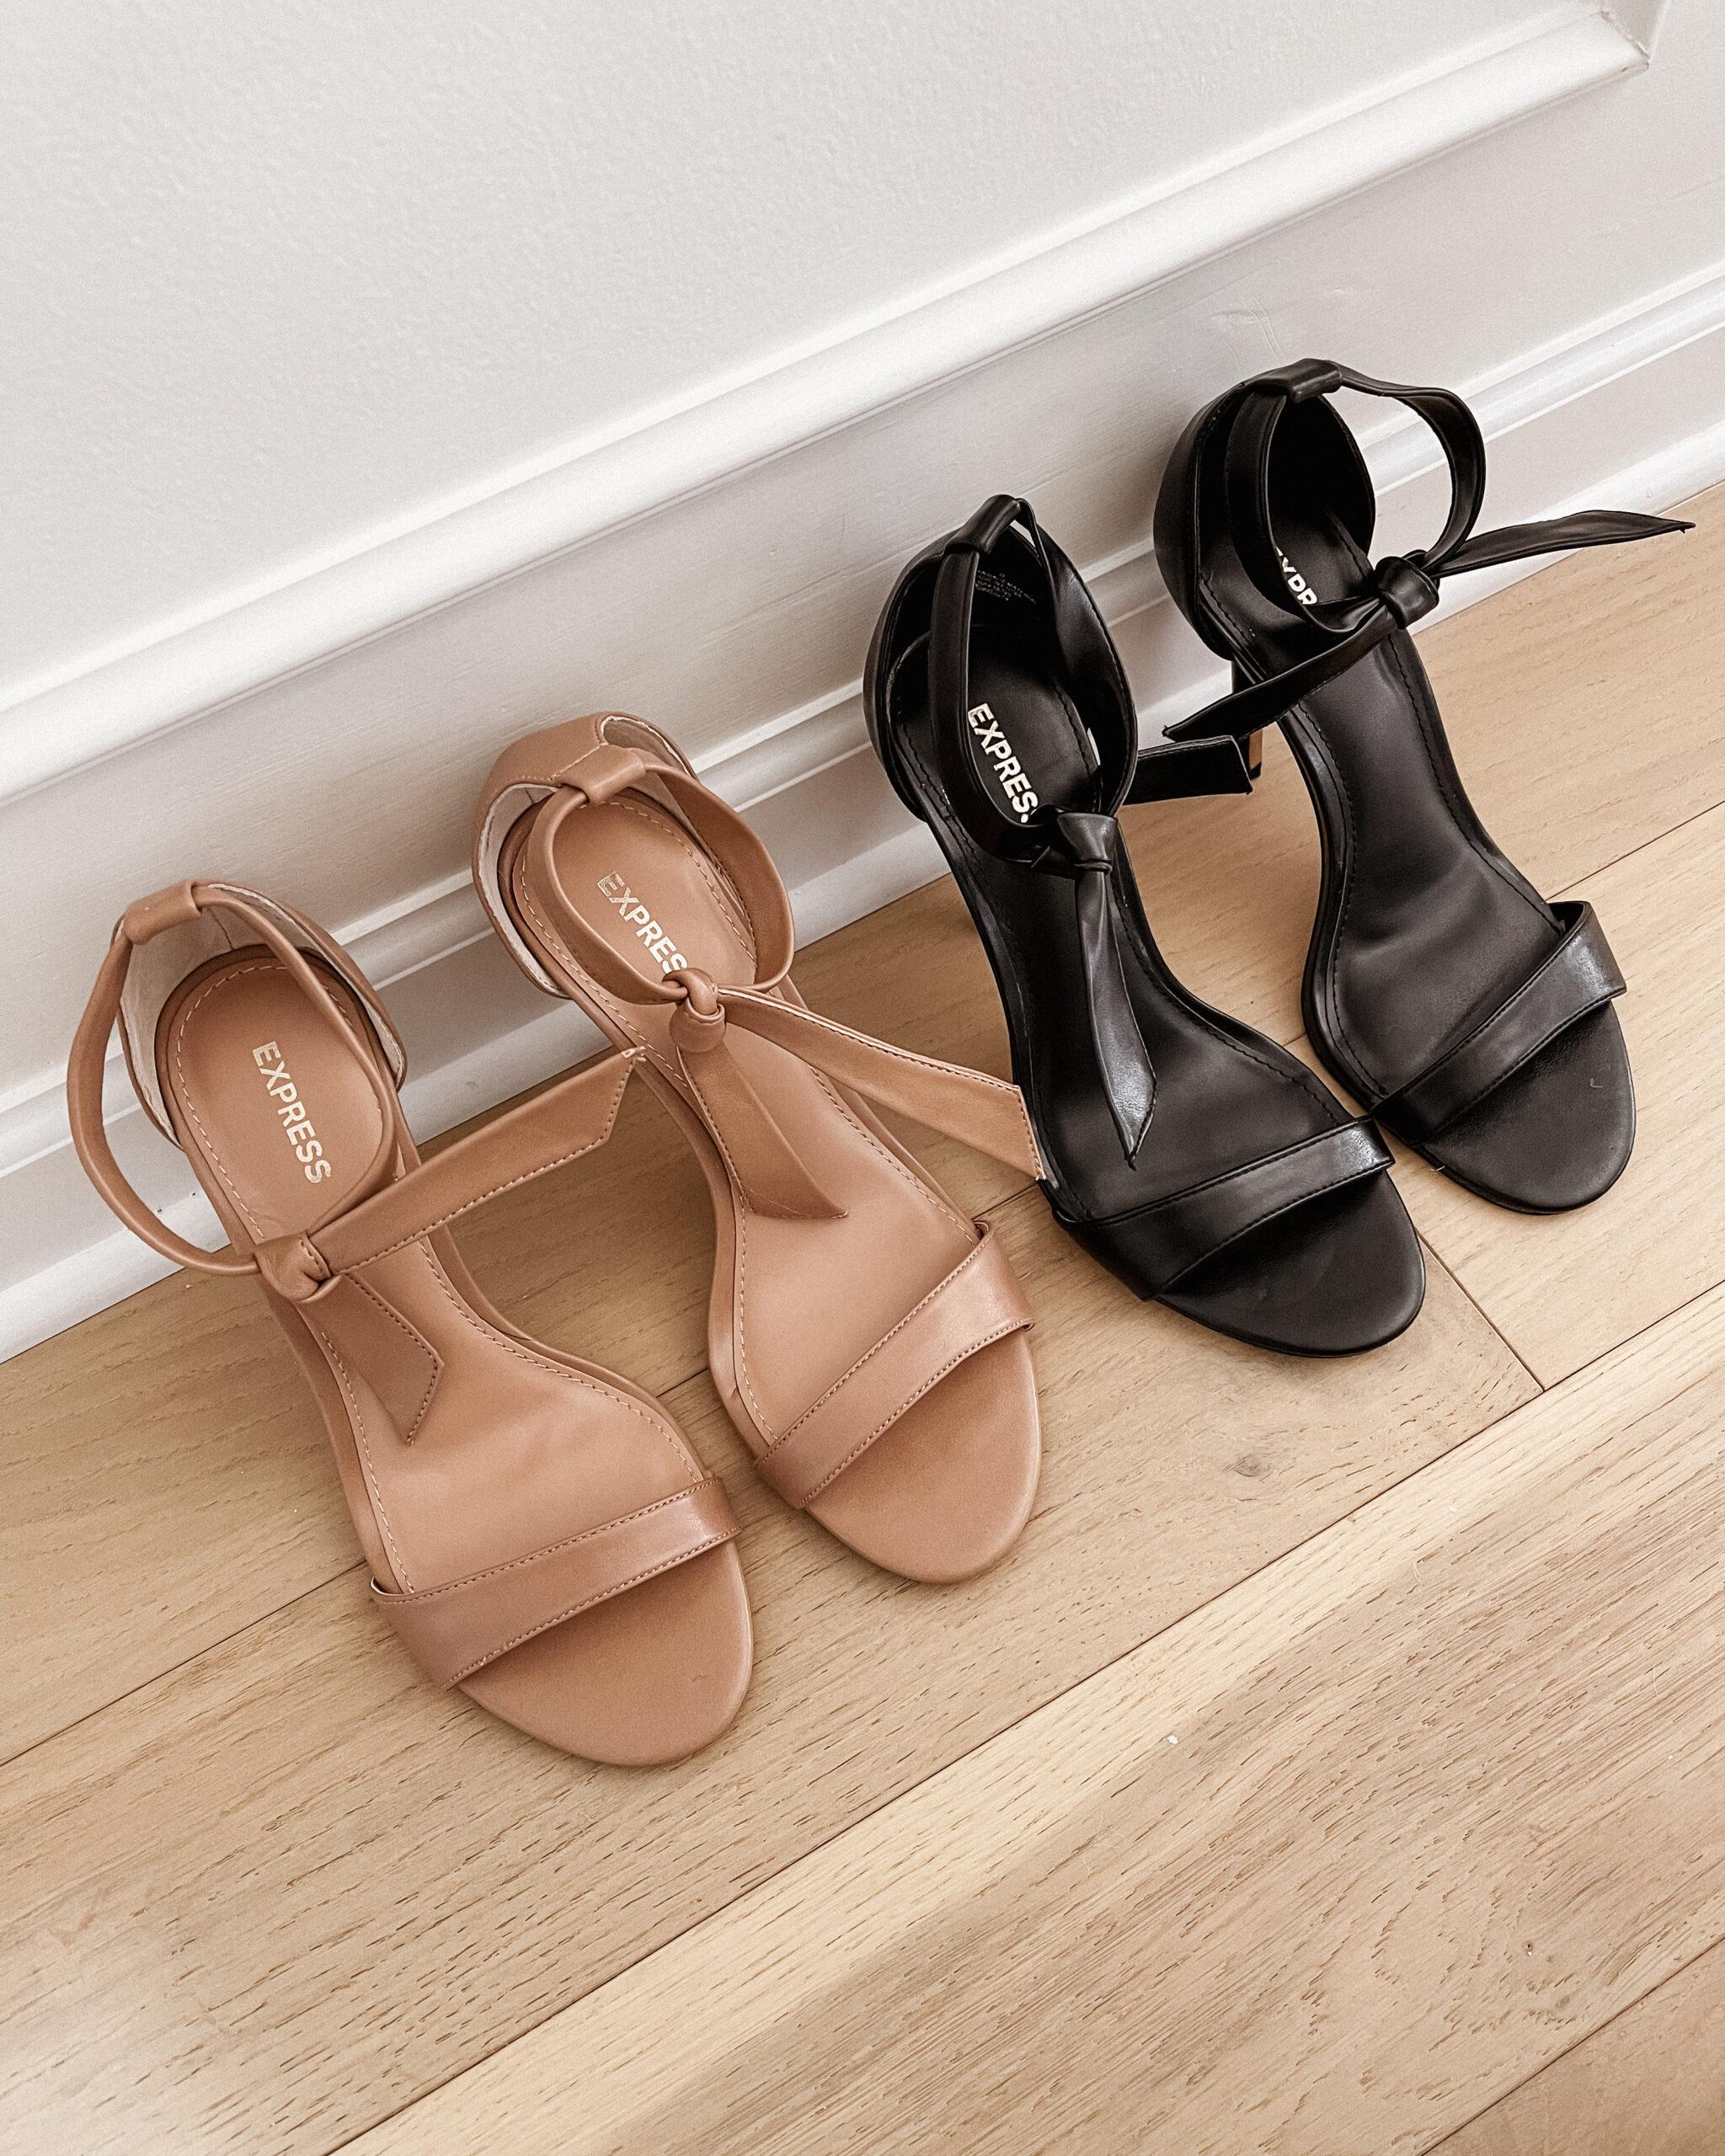 Fashion Jackson Express Tan Ankle Tie Heeld Sandals Black Ankle Tie Heeled Sandals